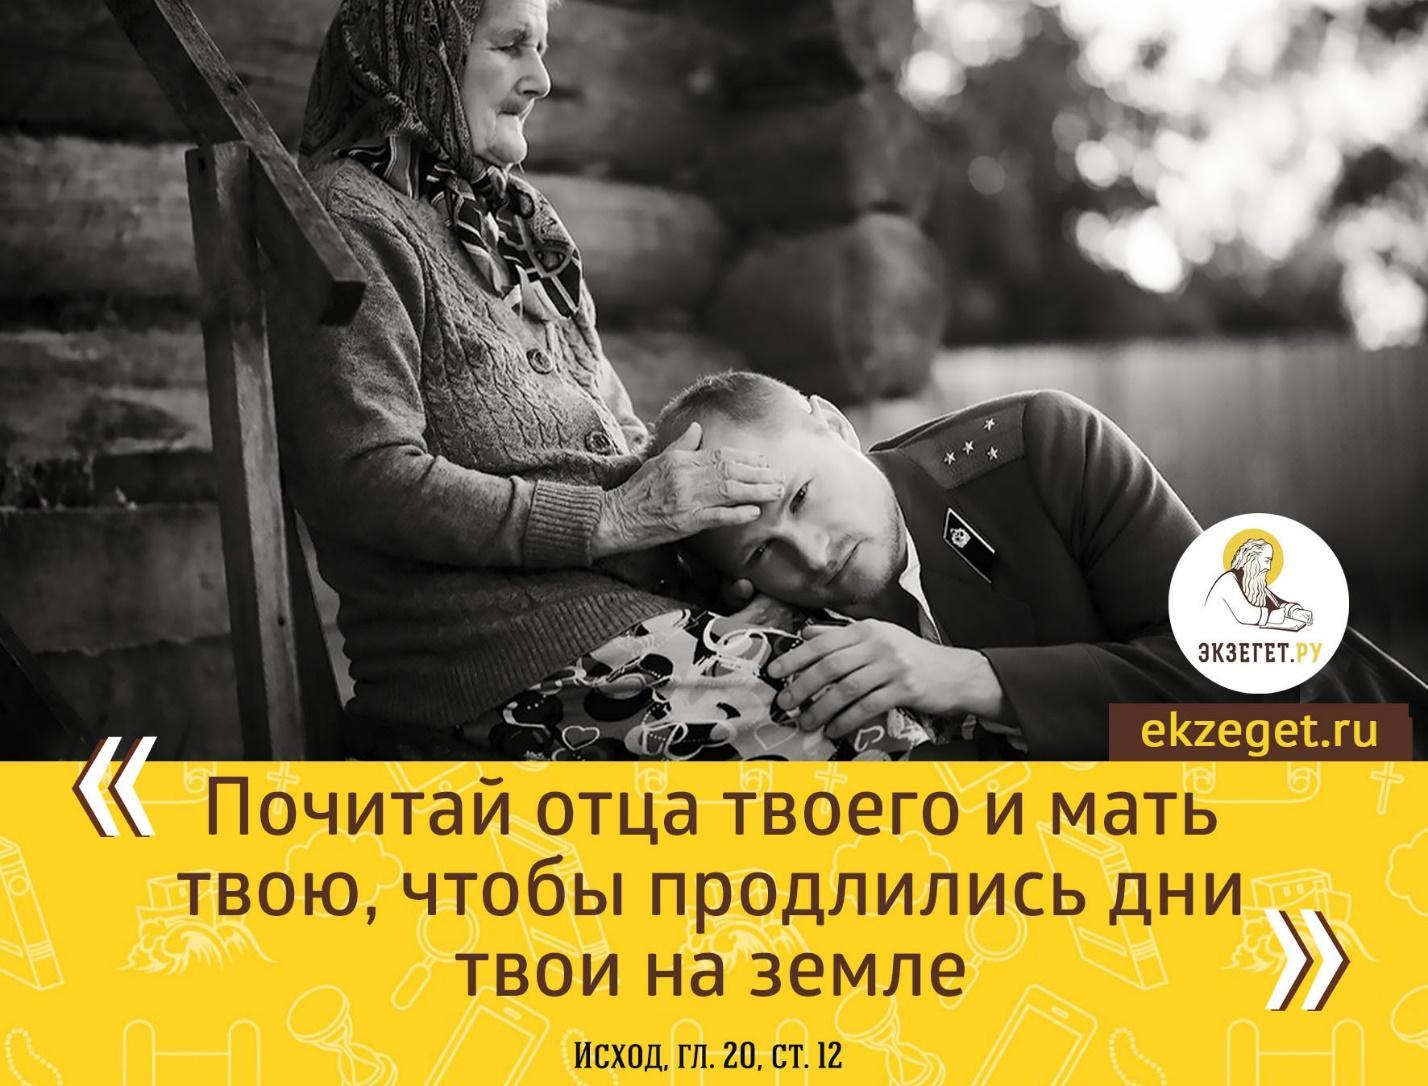 C:\Users\User\Desktop\Ростовцева_Юлия\29.07.2020\McSY6rG9X-swa3KUq2wOl7z-detFDBhh.jpg